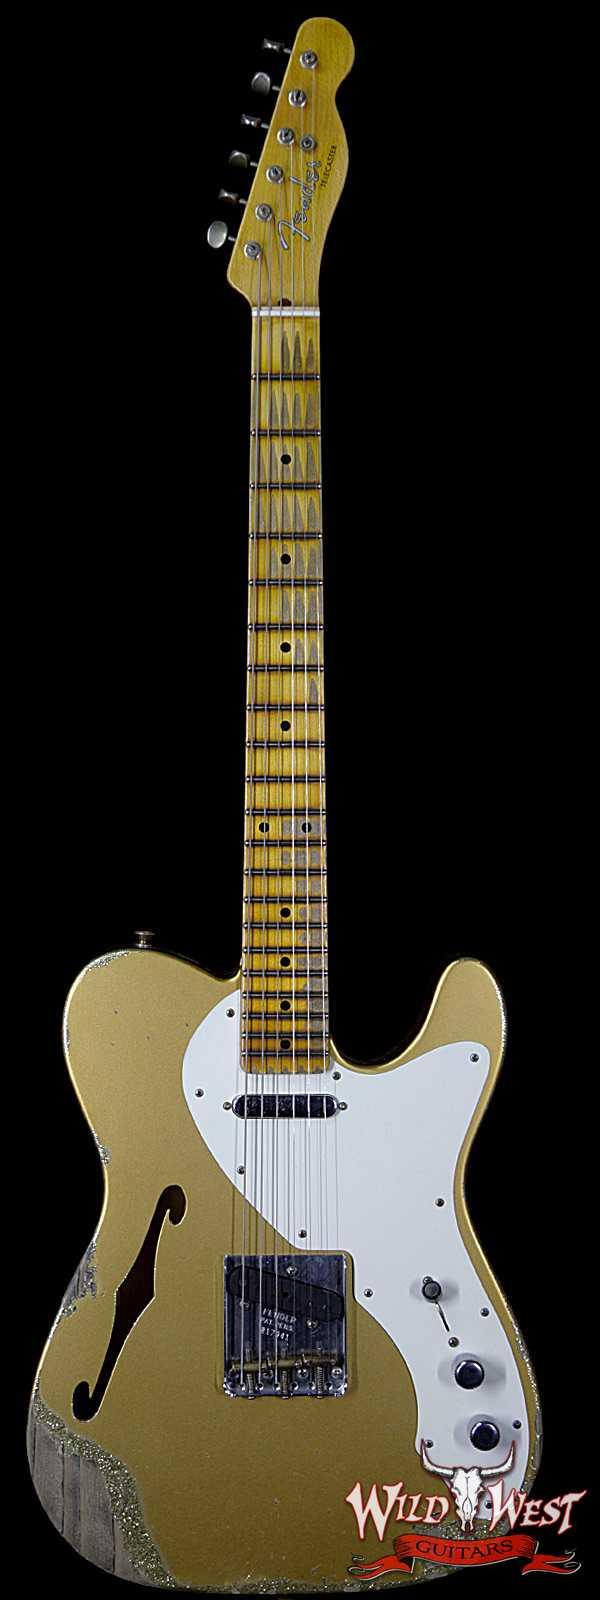 Fender Custom Shop NAMM Ltd 50's Telecaster Thinline Heavy Relic Aztec Gold over Gold Sparkle